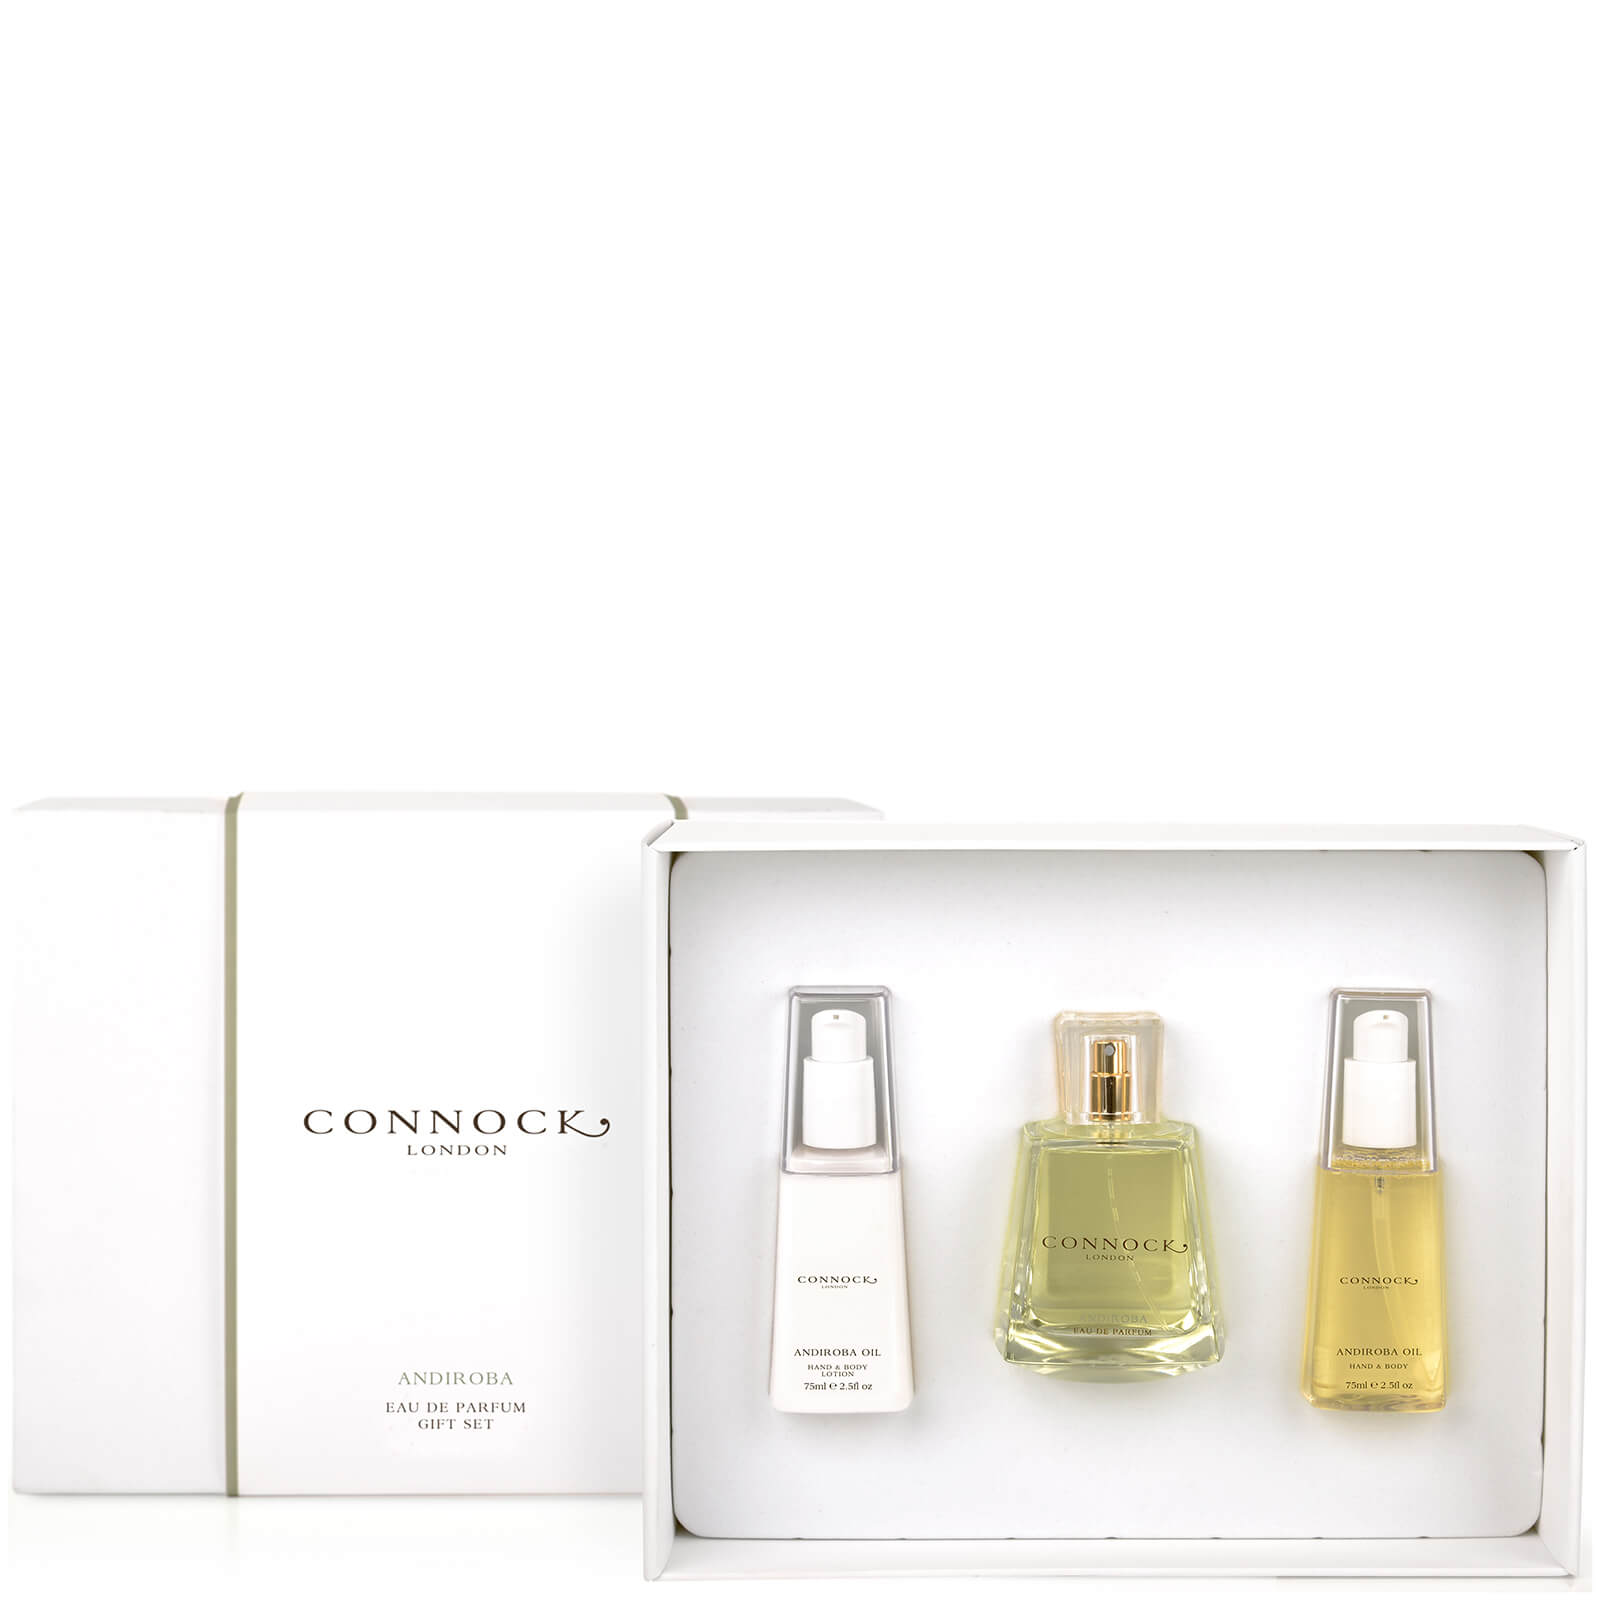 cfcff8b38 Connock London Andiroba Eau de Parfum Gift Set